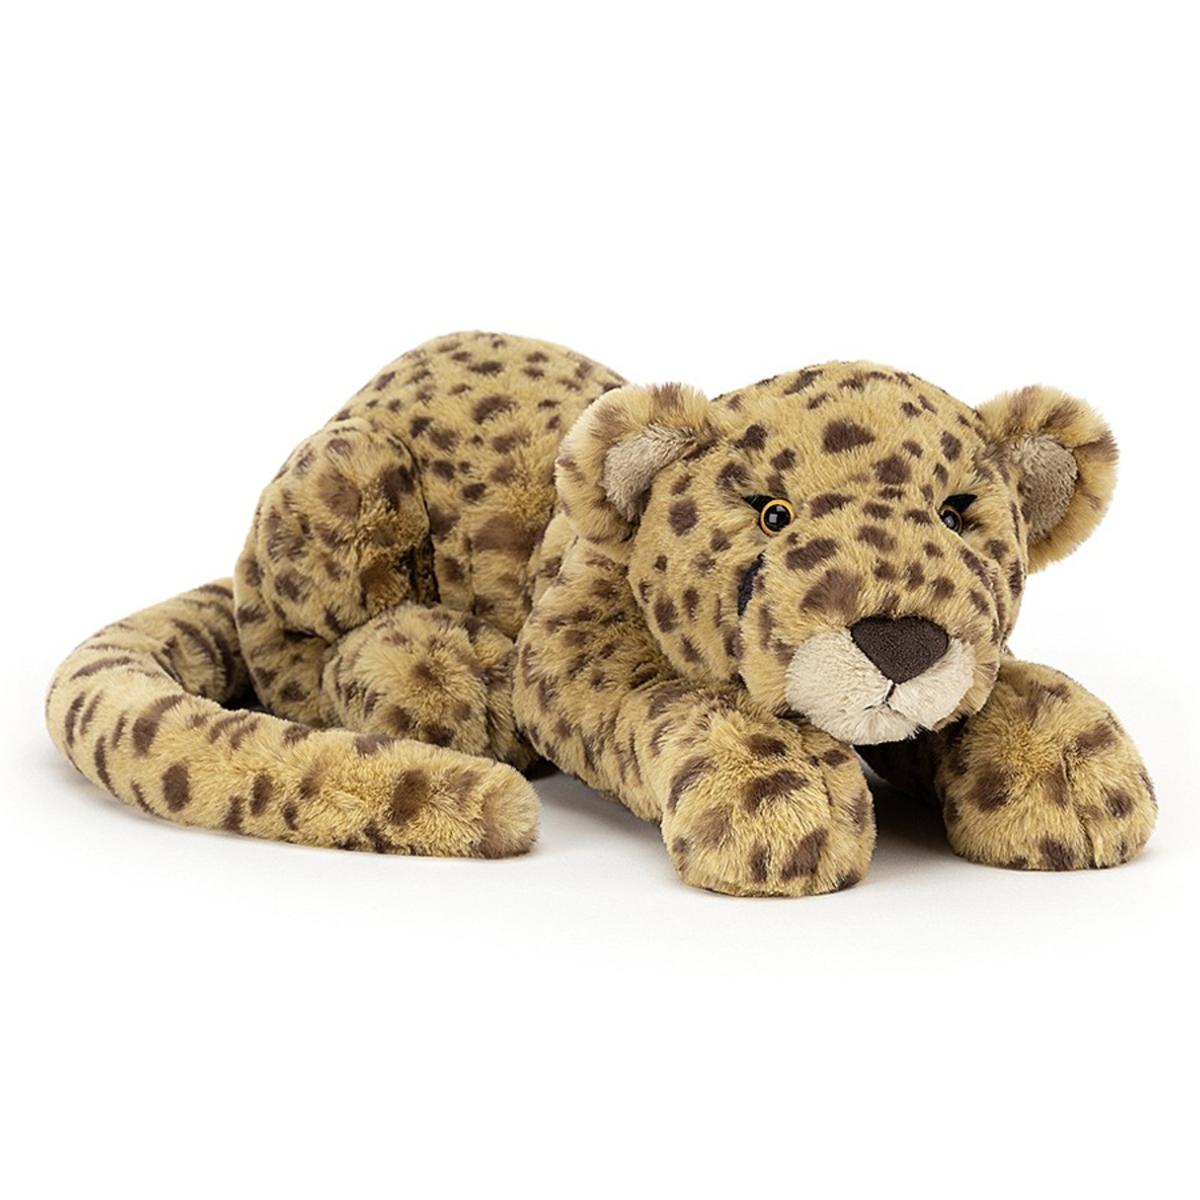 Peluche Charley Cheetah - Large Peluche Guépard 46 cm